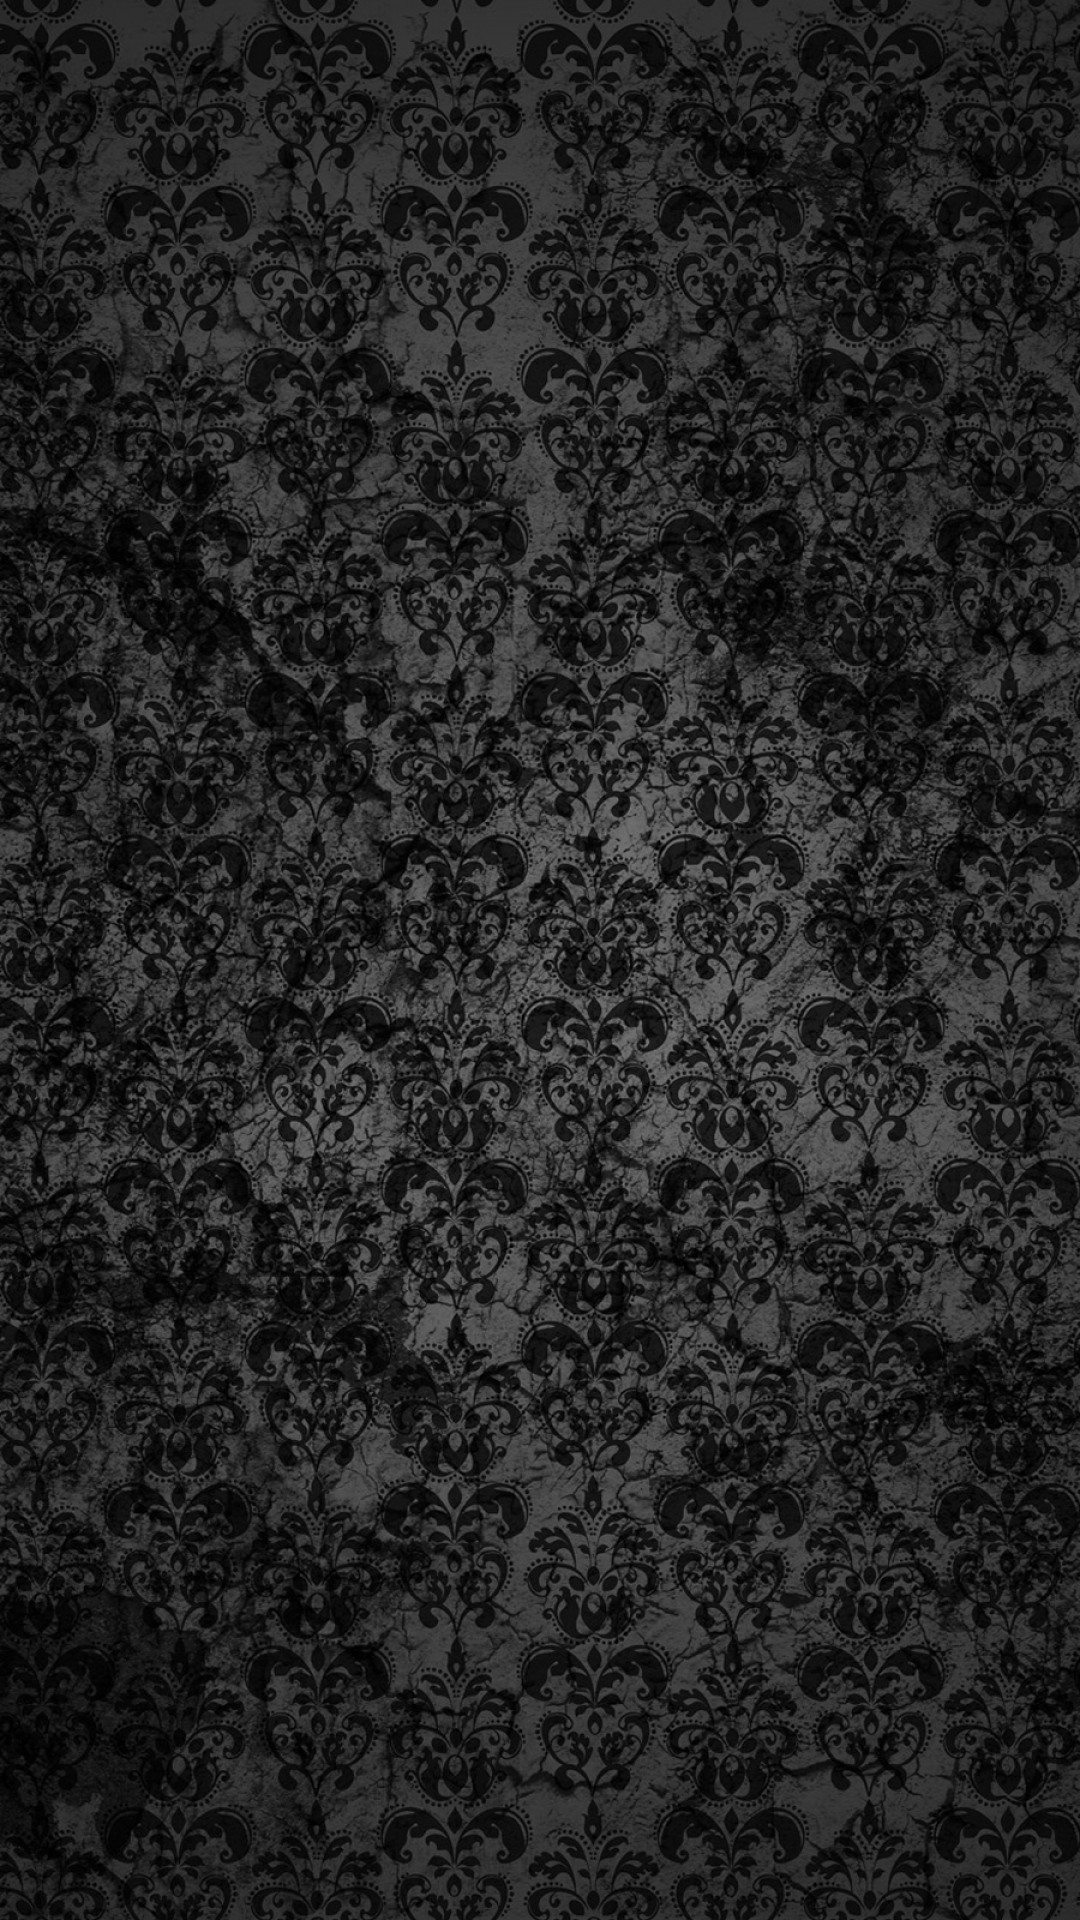 Black Lace Dark Grunge Pattern iPhone 6 Plus HD Wallpaper …